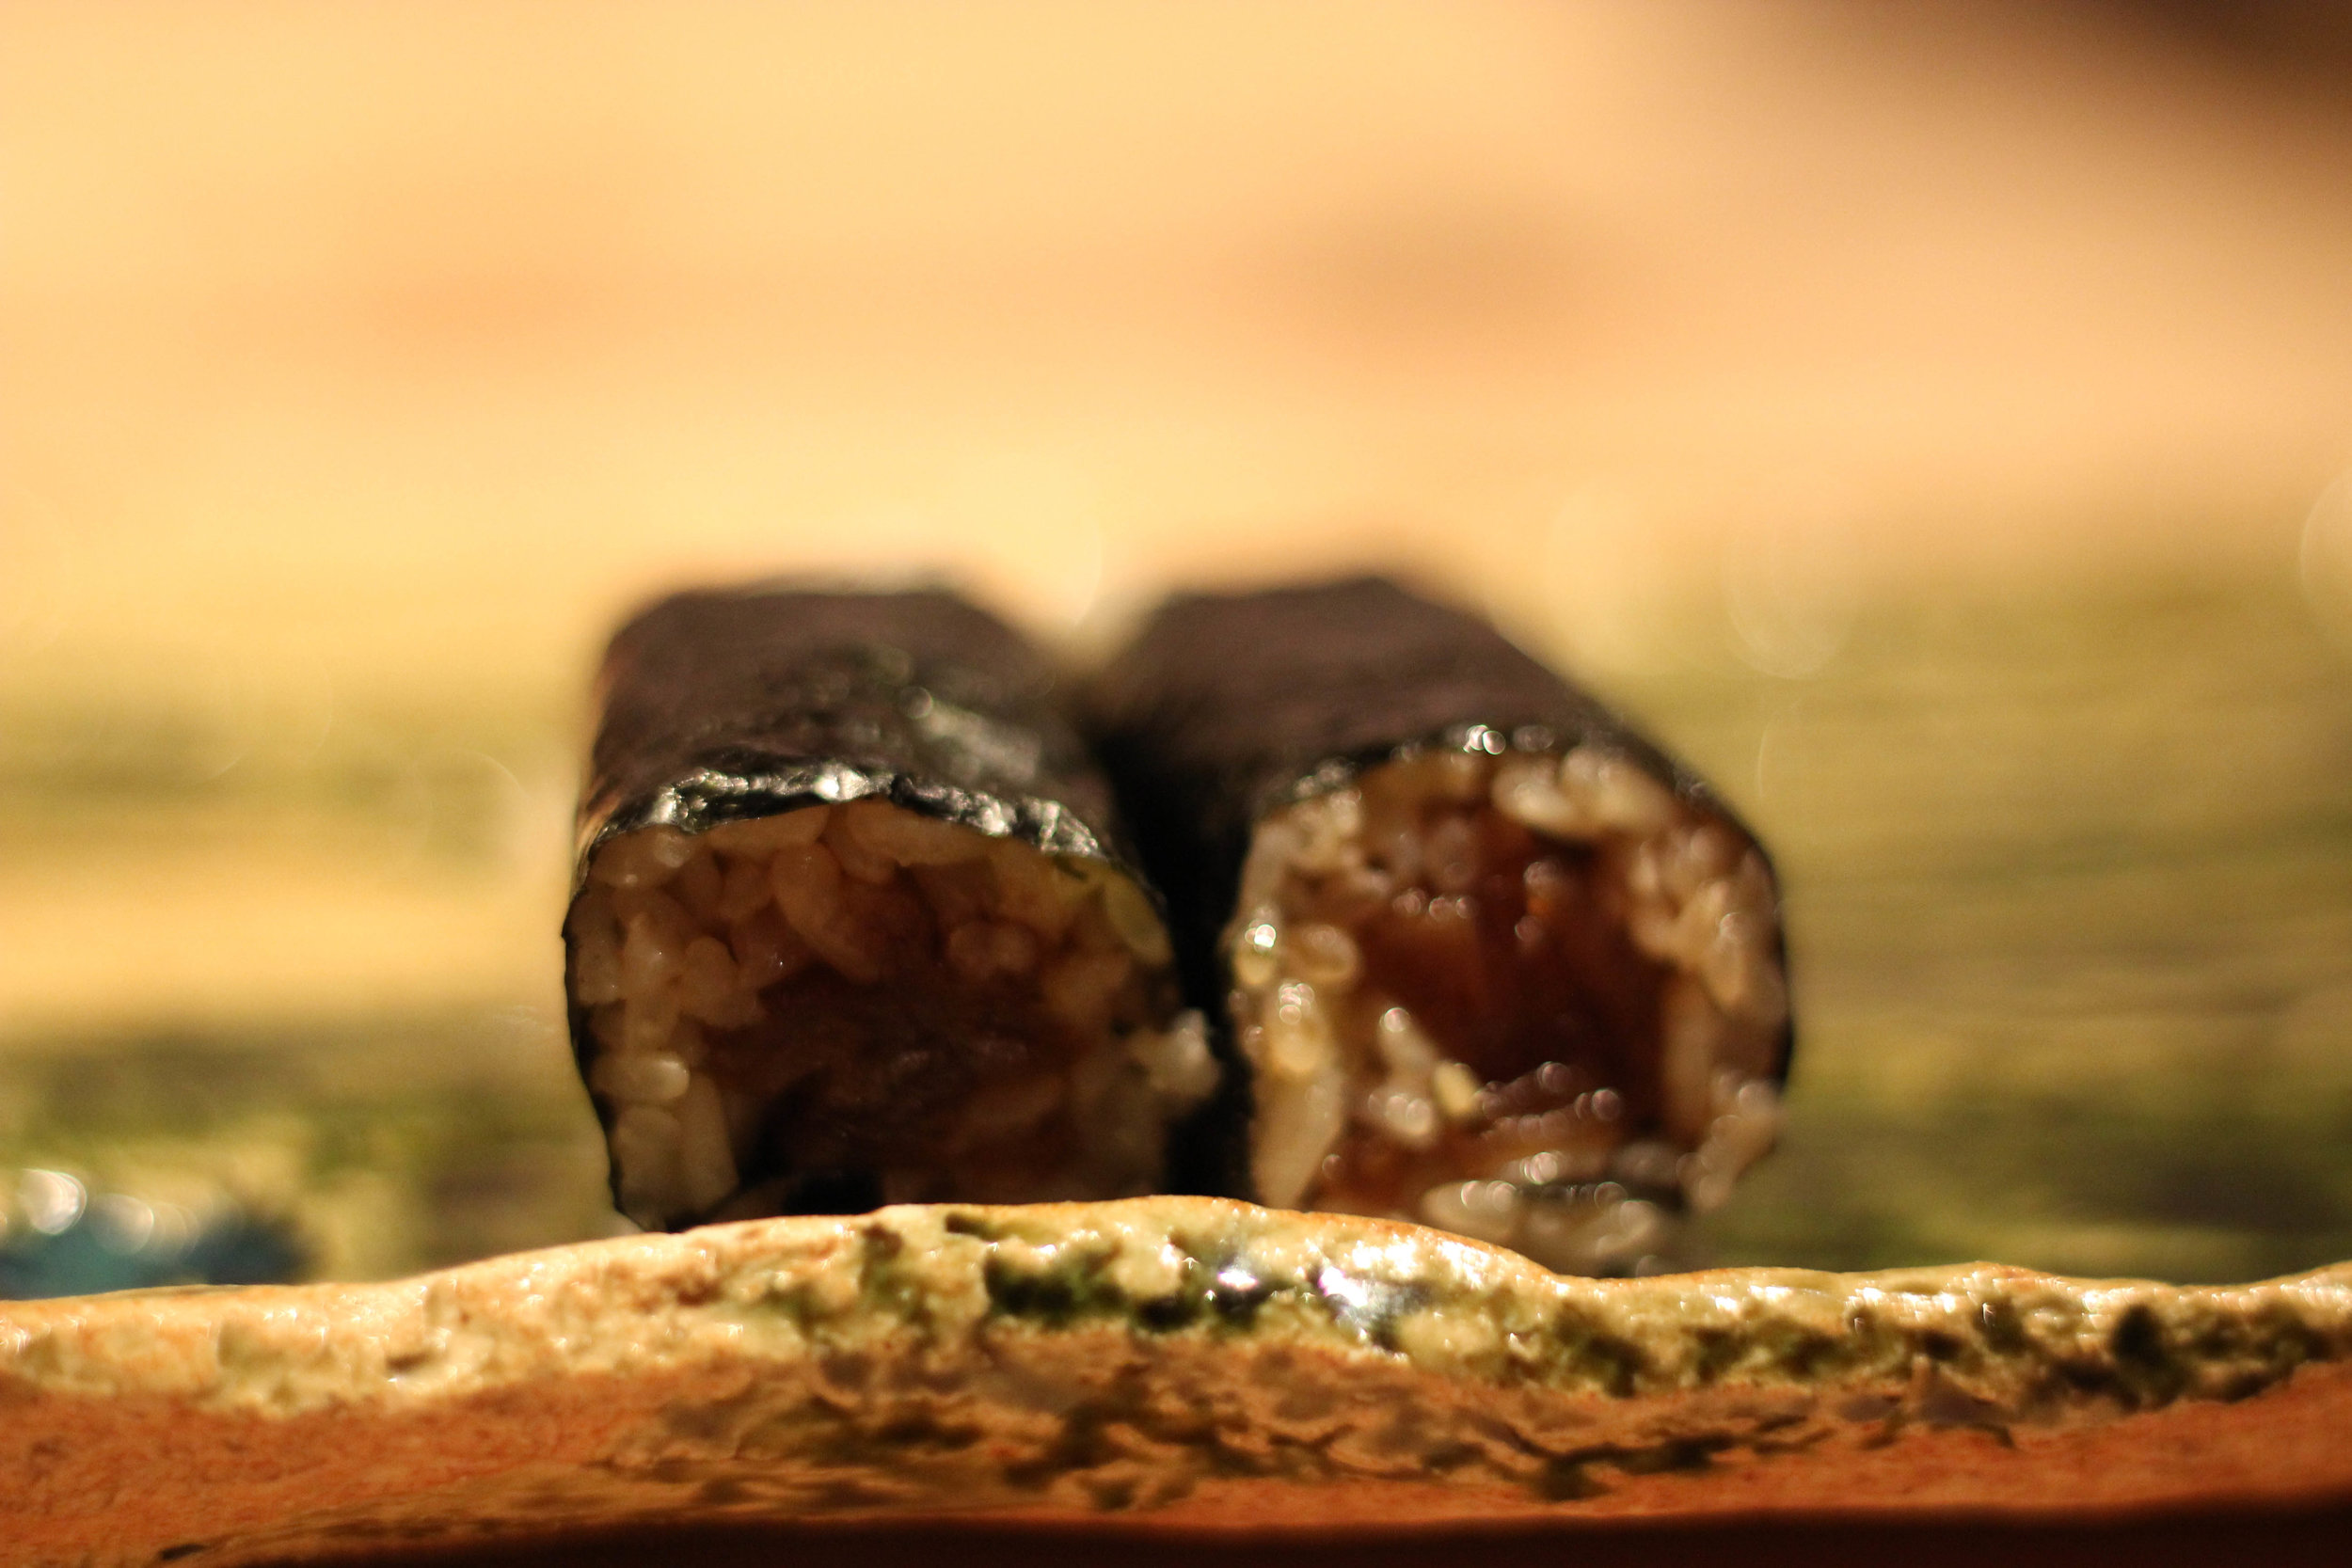 Kanpyo maki (gourd roll)